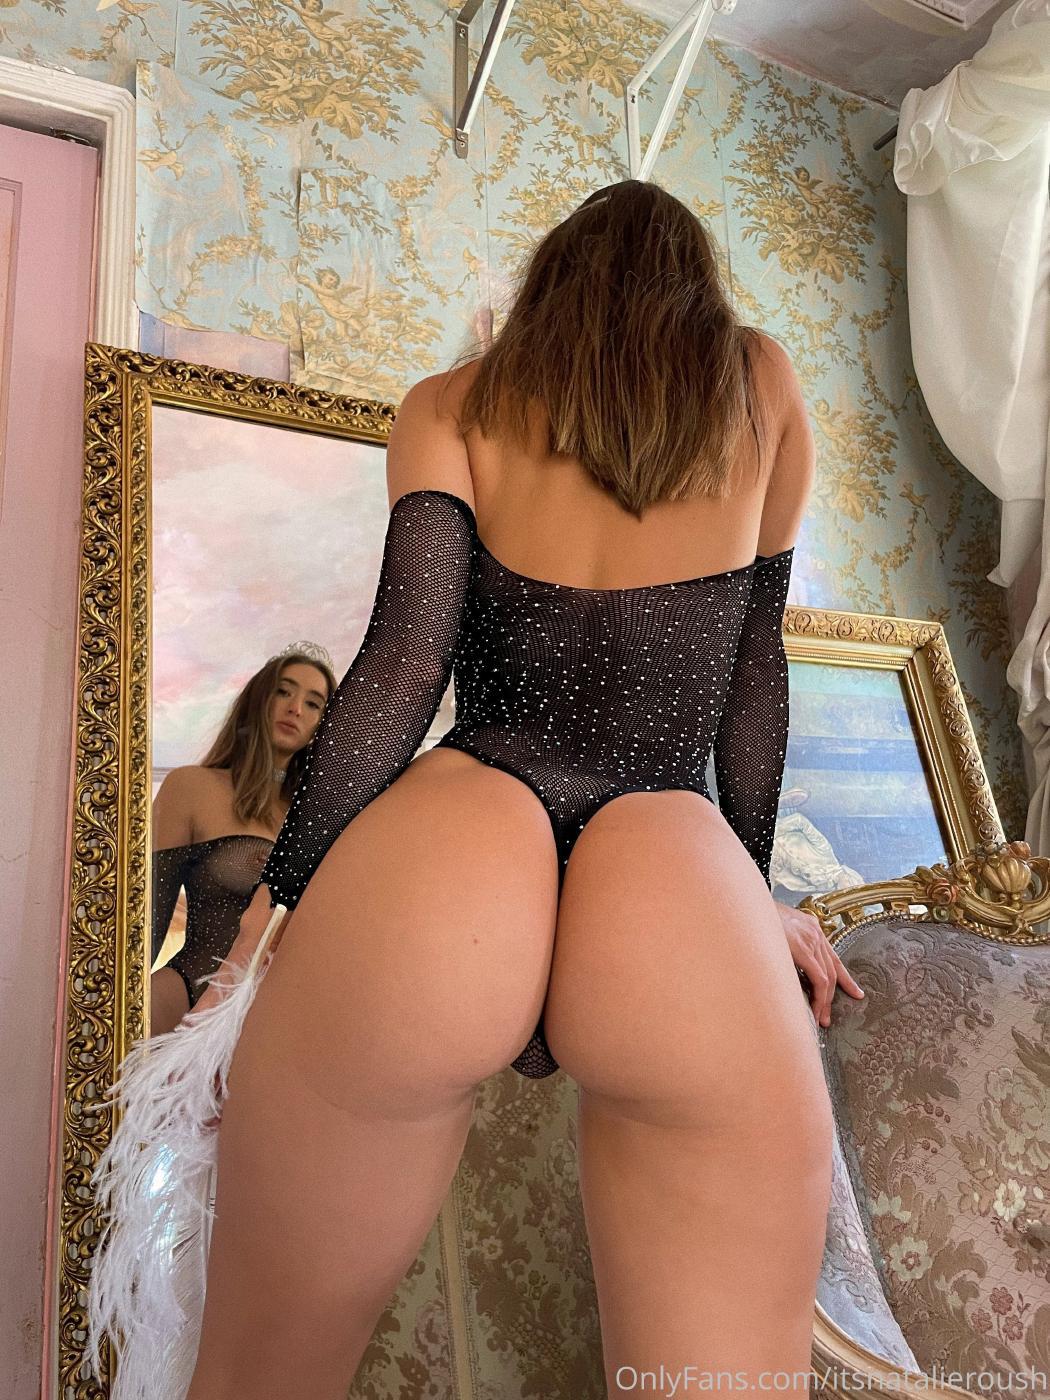 Natalie Roush Nude Fishnet Onlyfans Set Leaked Atkxzg